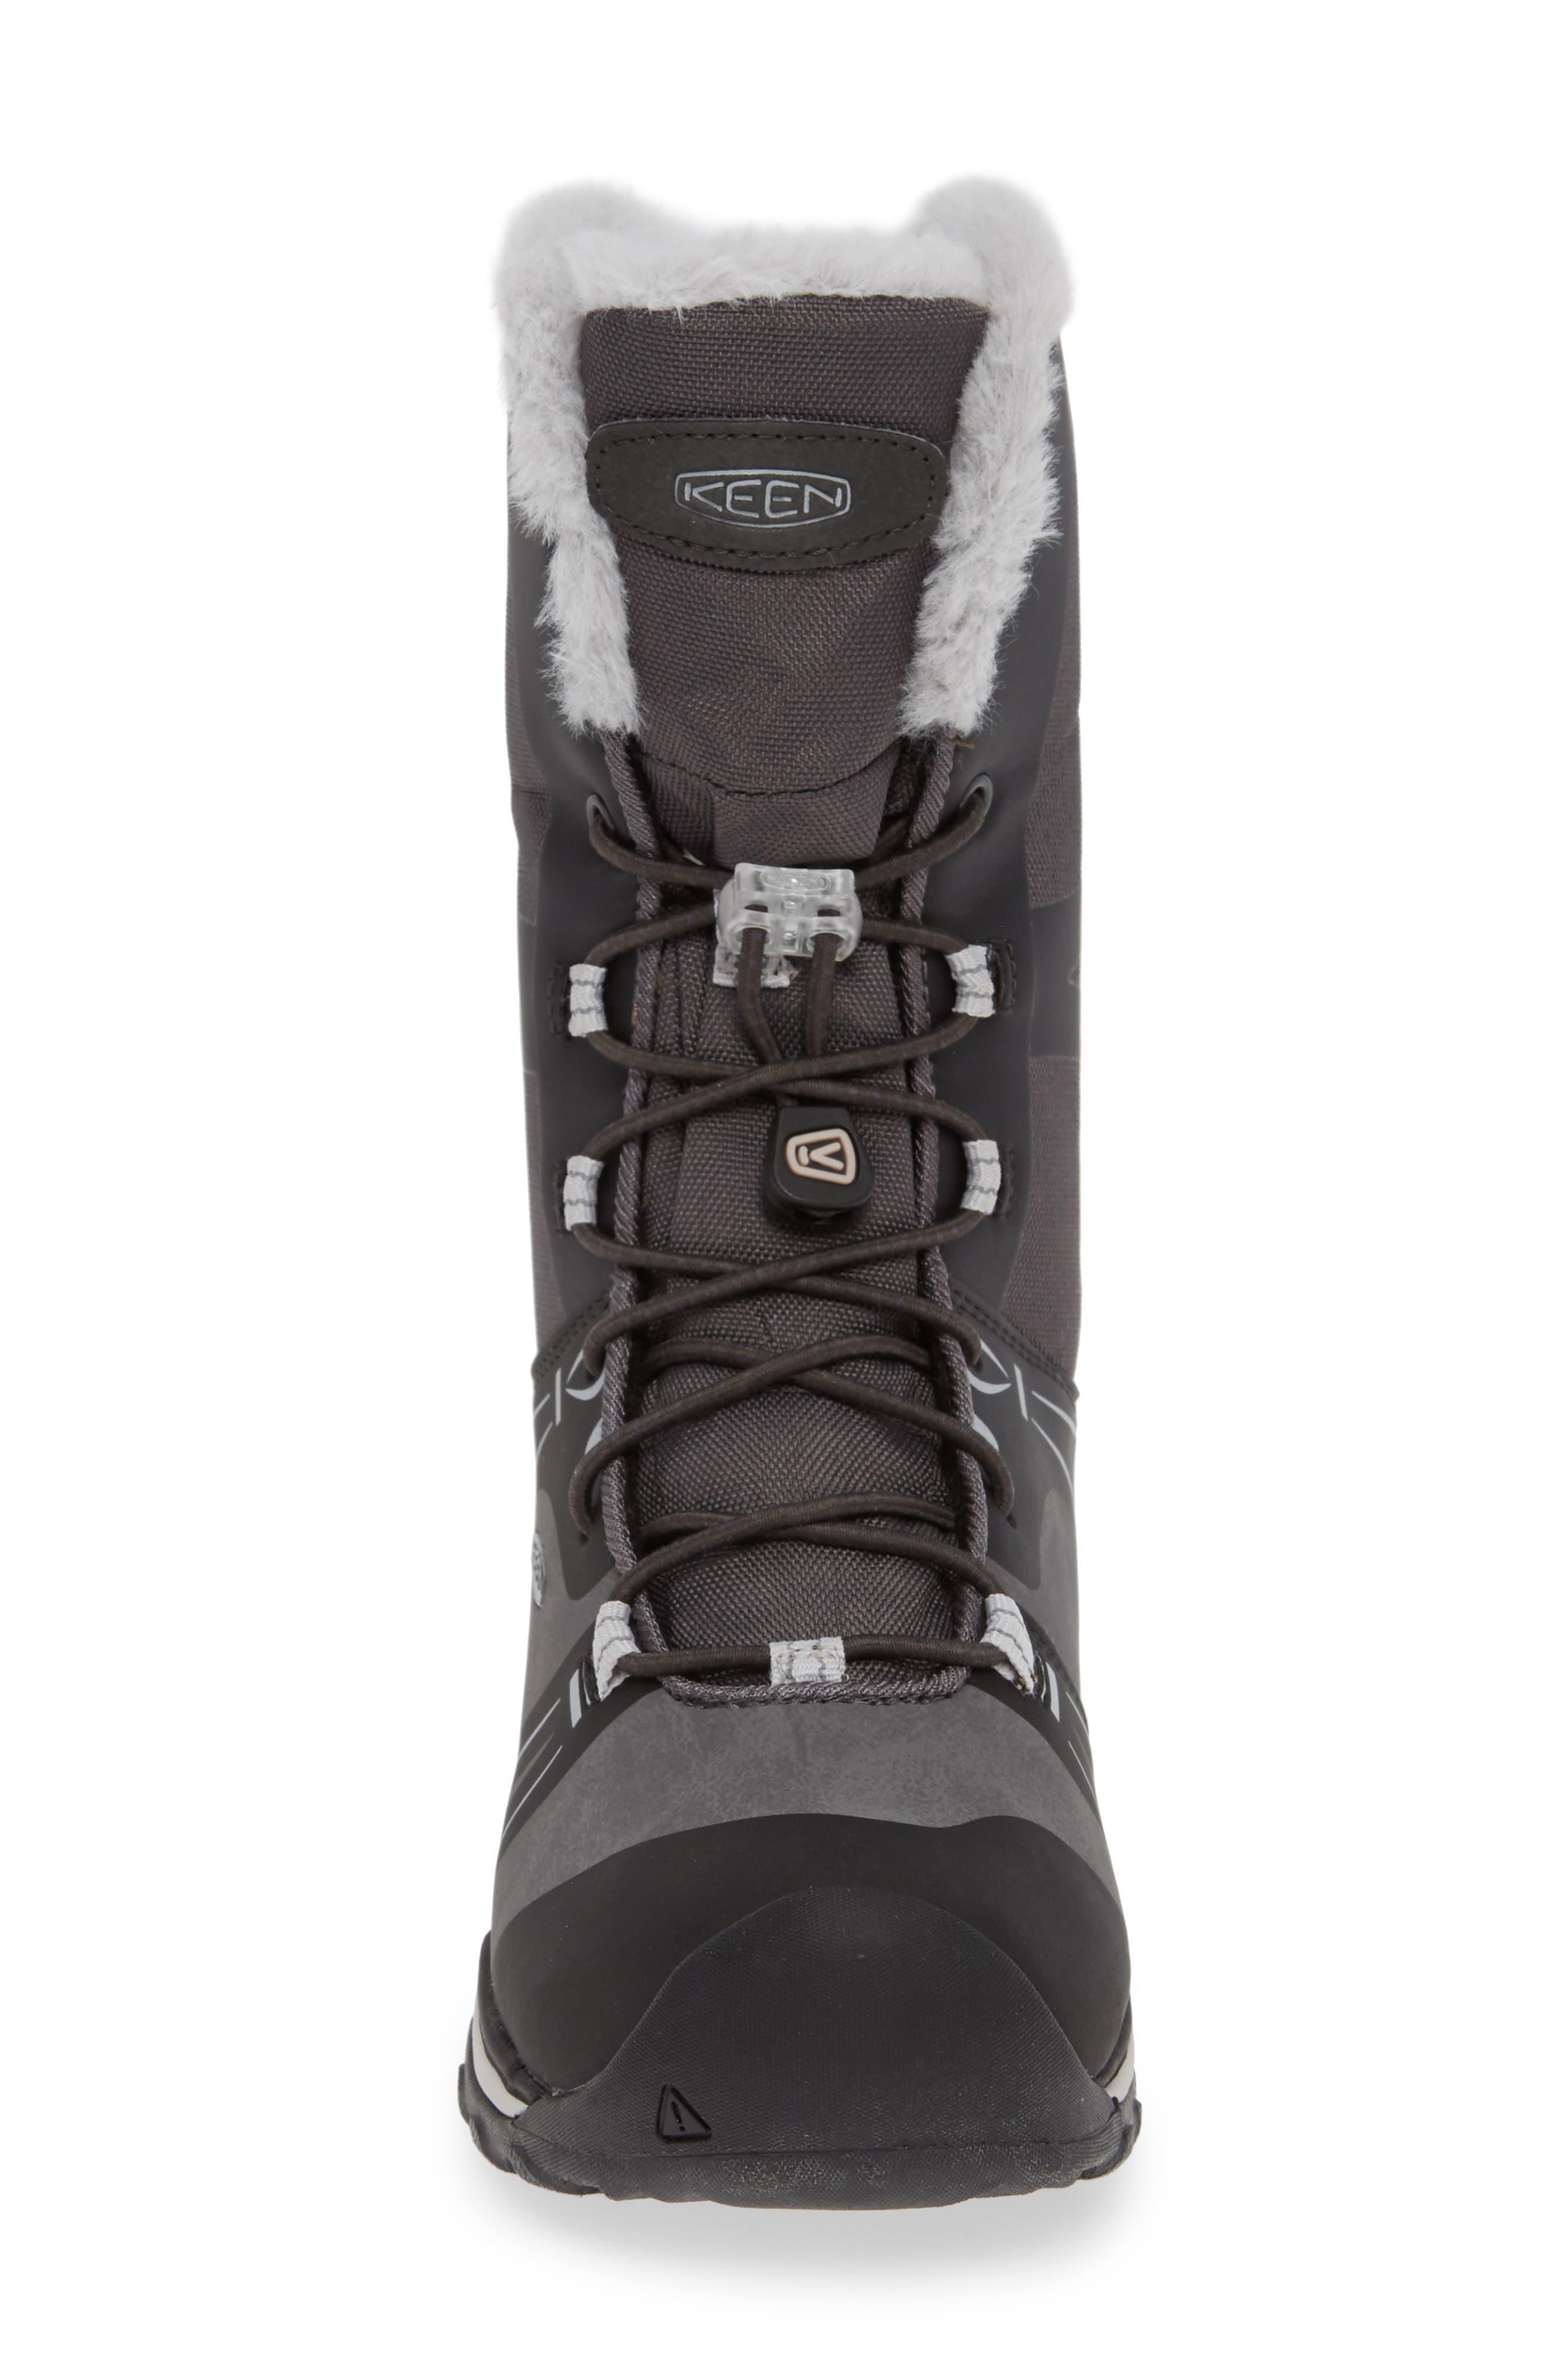 KEEN, Terradora Faux Fur Trim Waterproof Snow Boot, Alternate thumbnail 4, color, RAVEN/ VAPOR